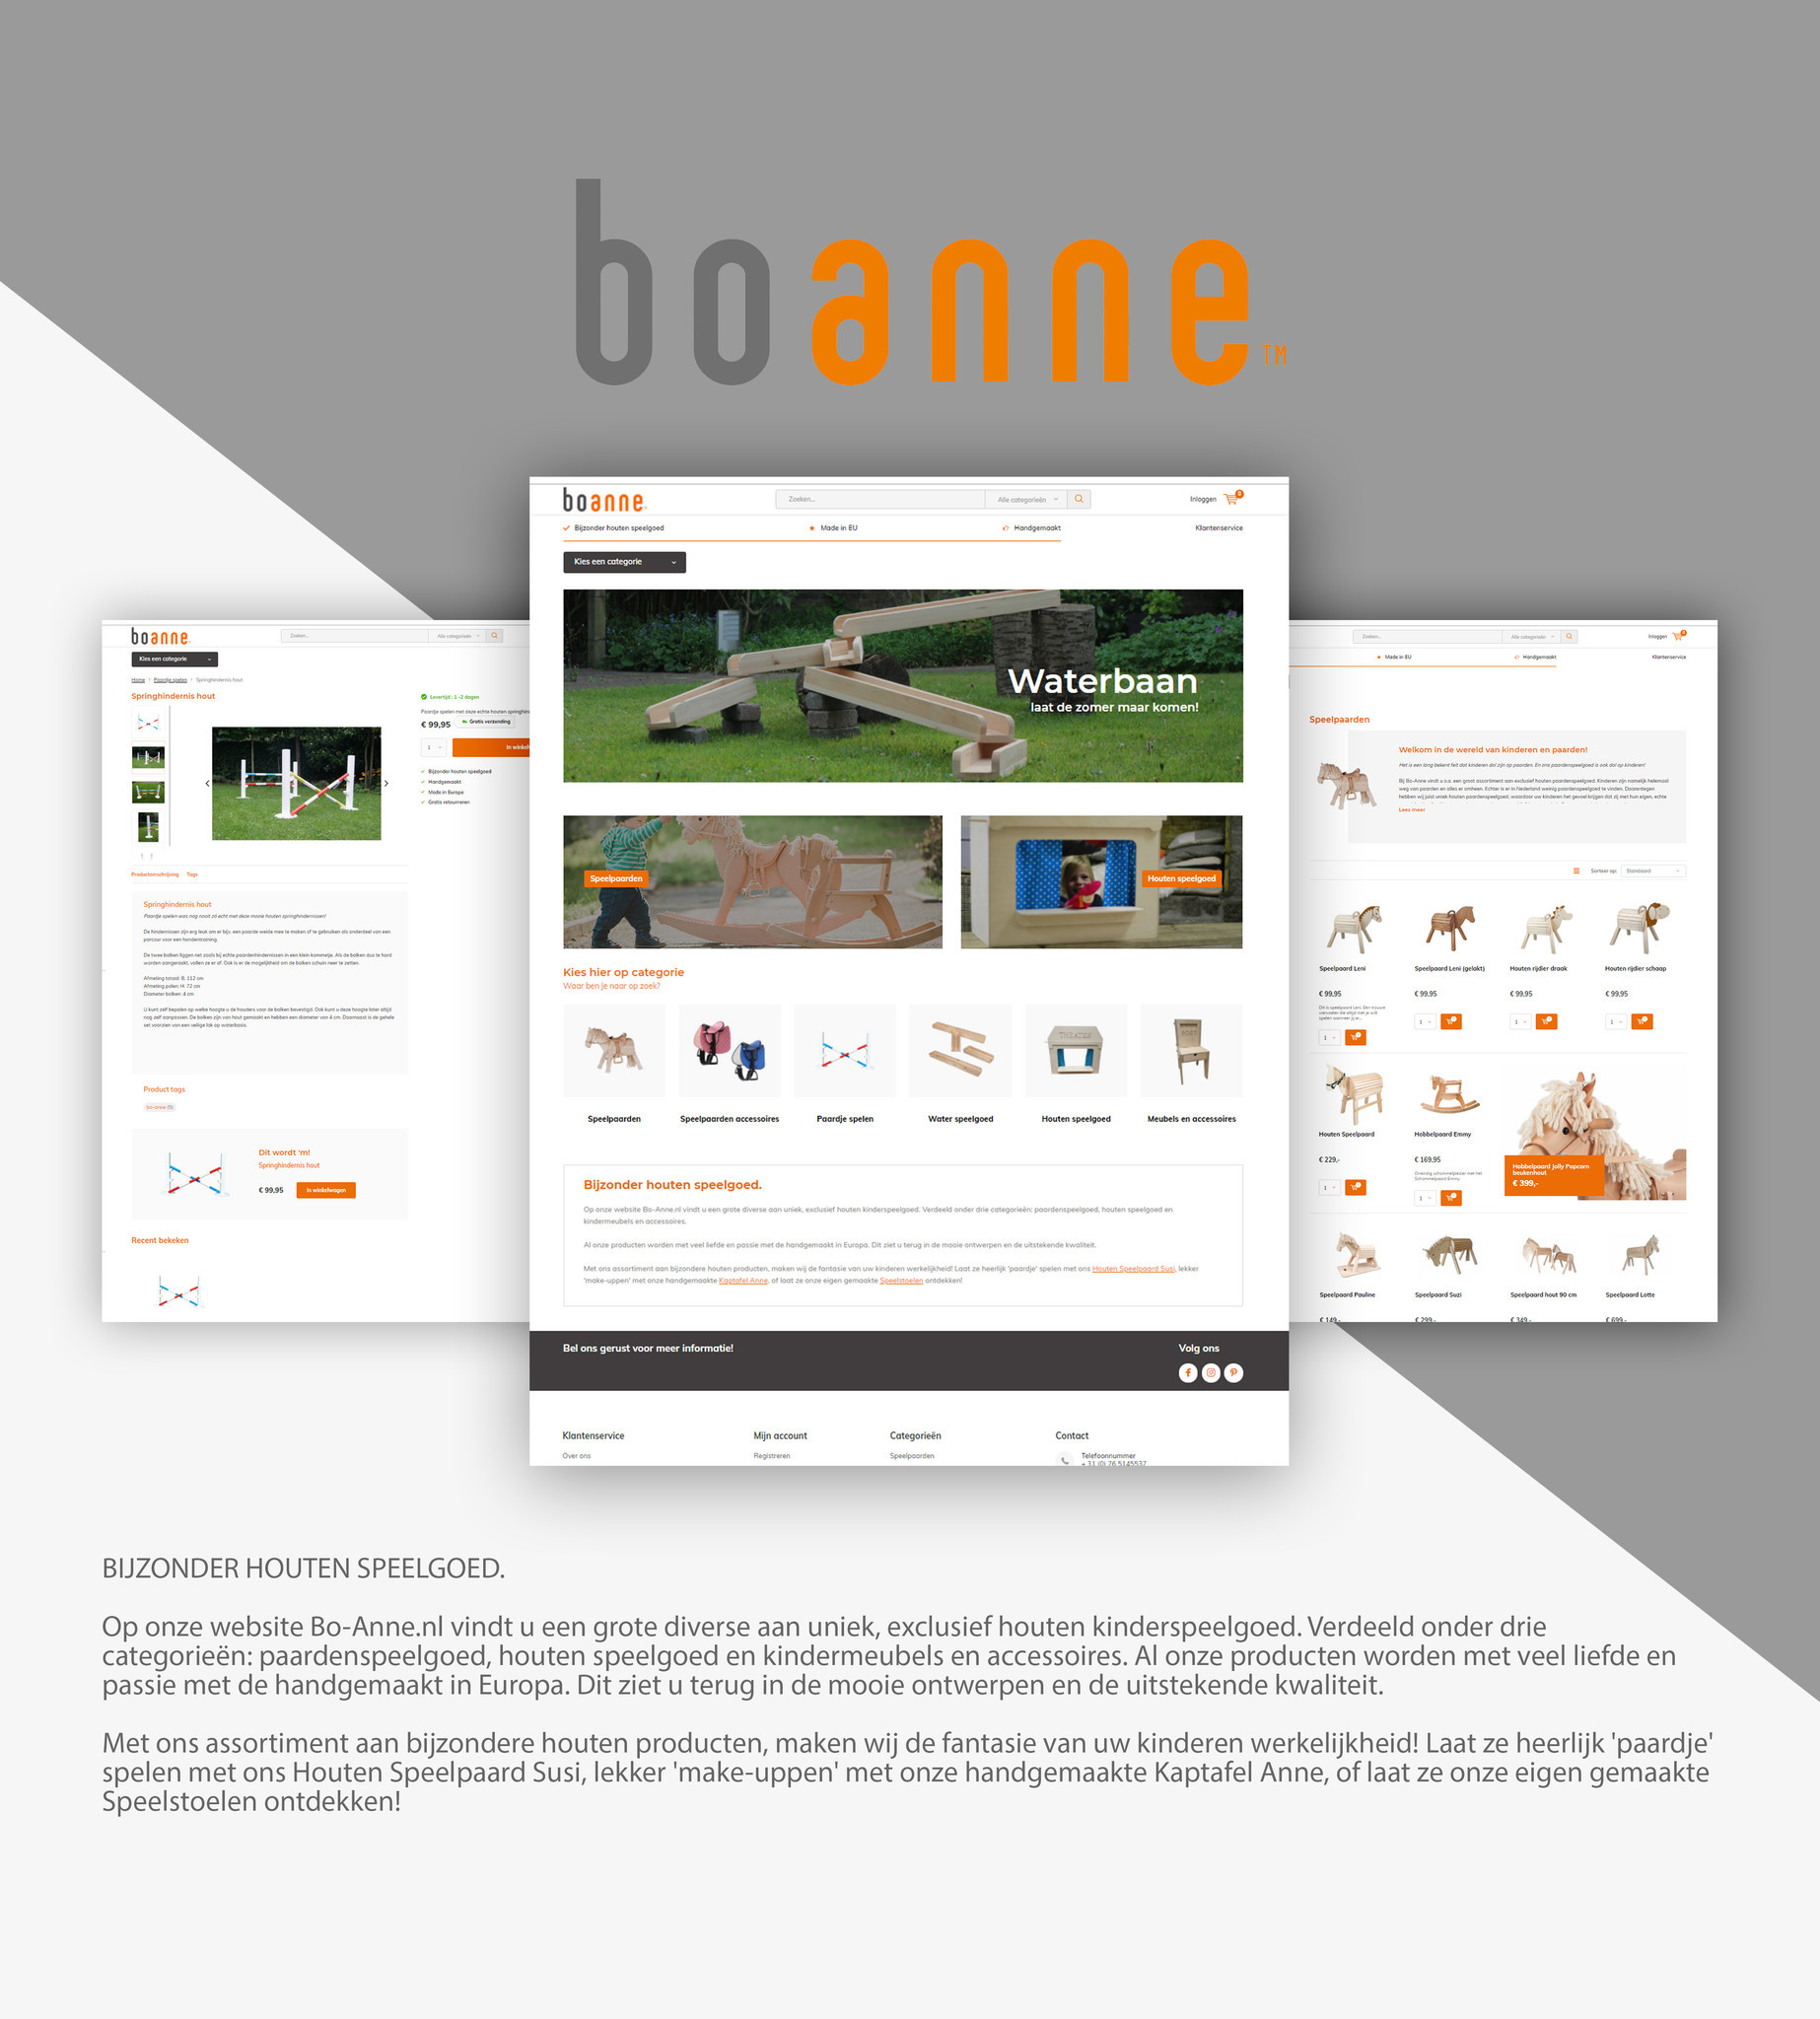 bo-anne.nl